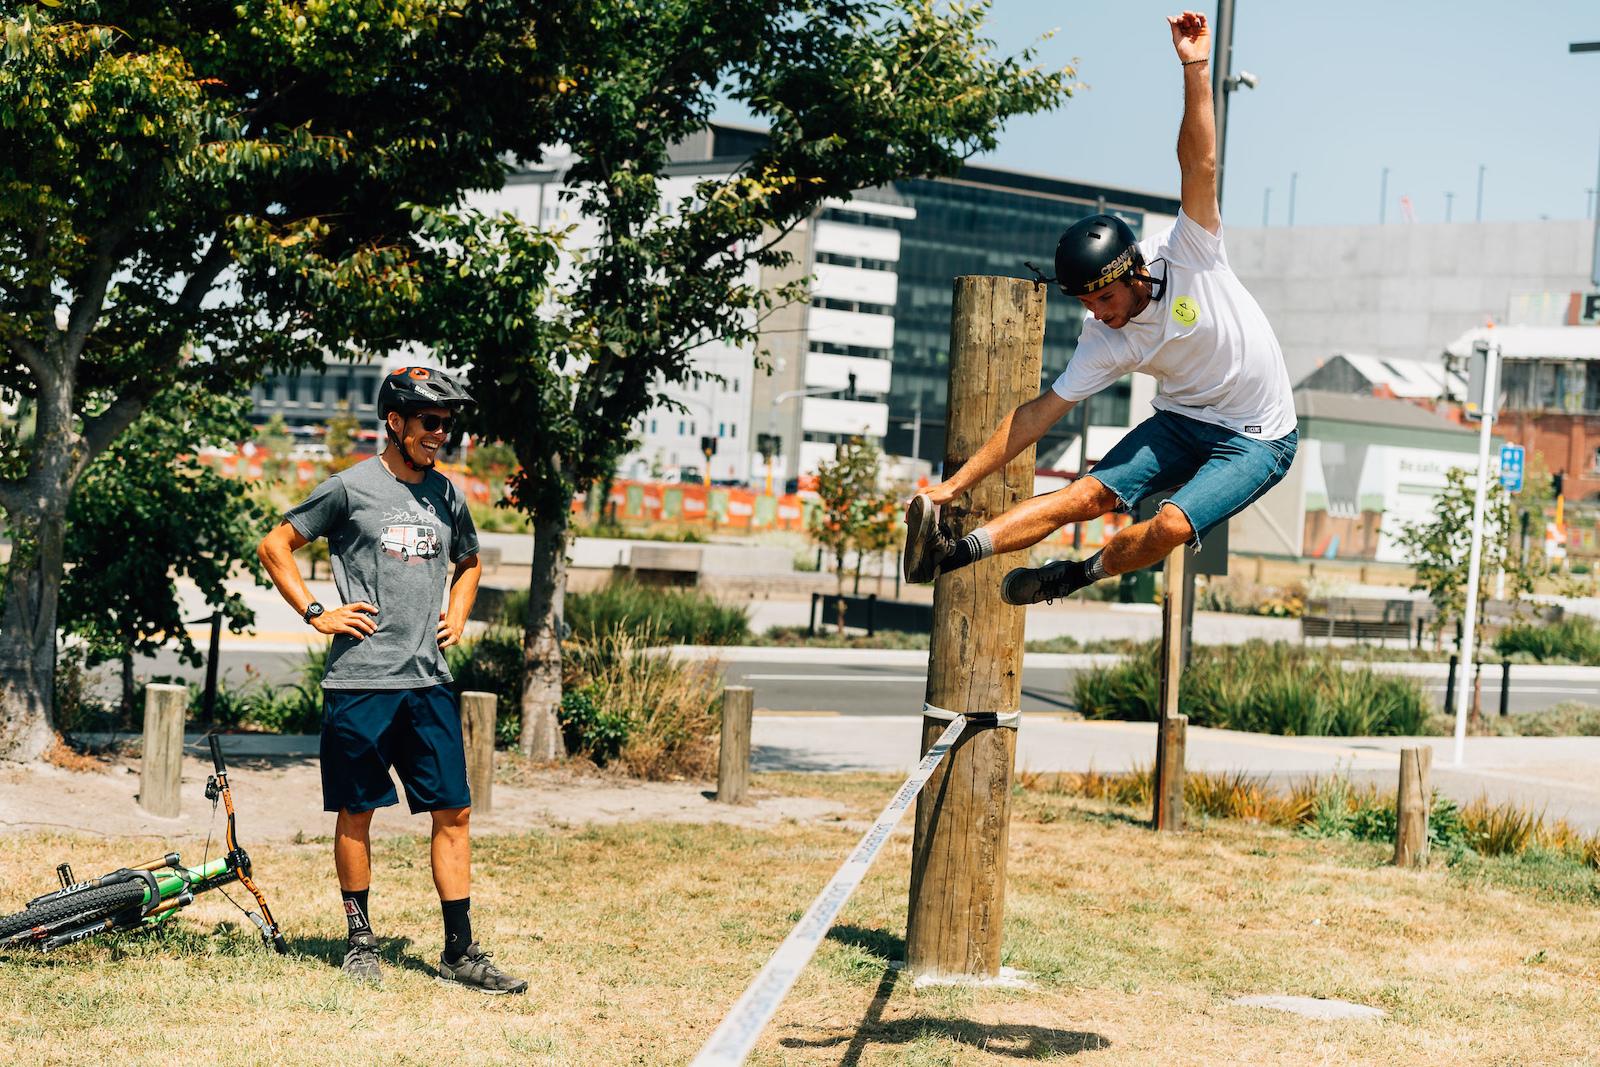 Billy proving he s got the balance skills.